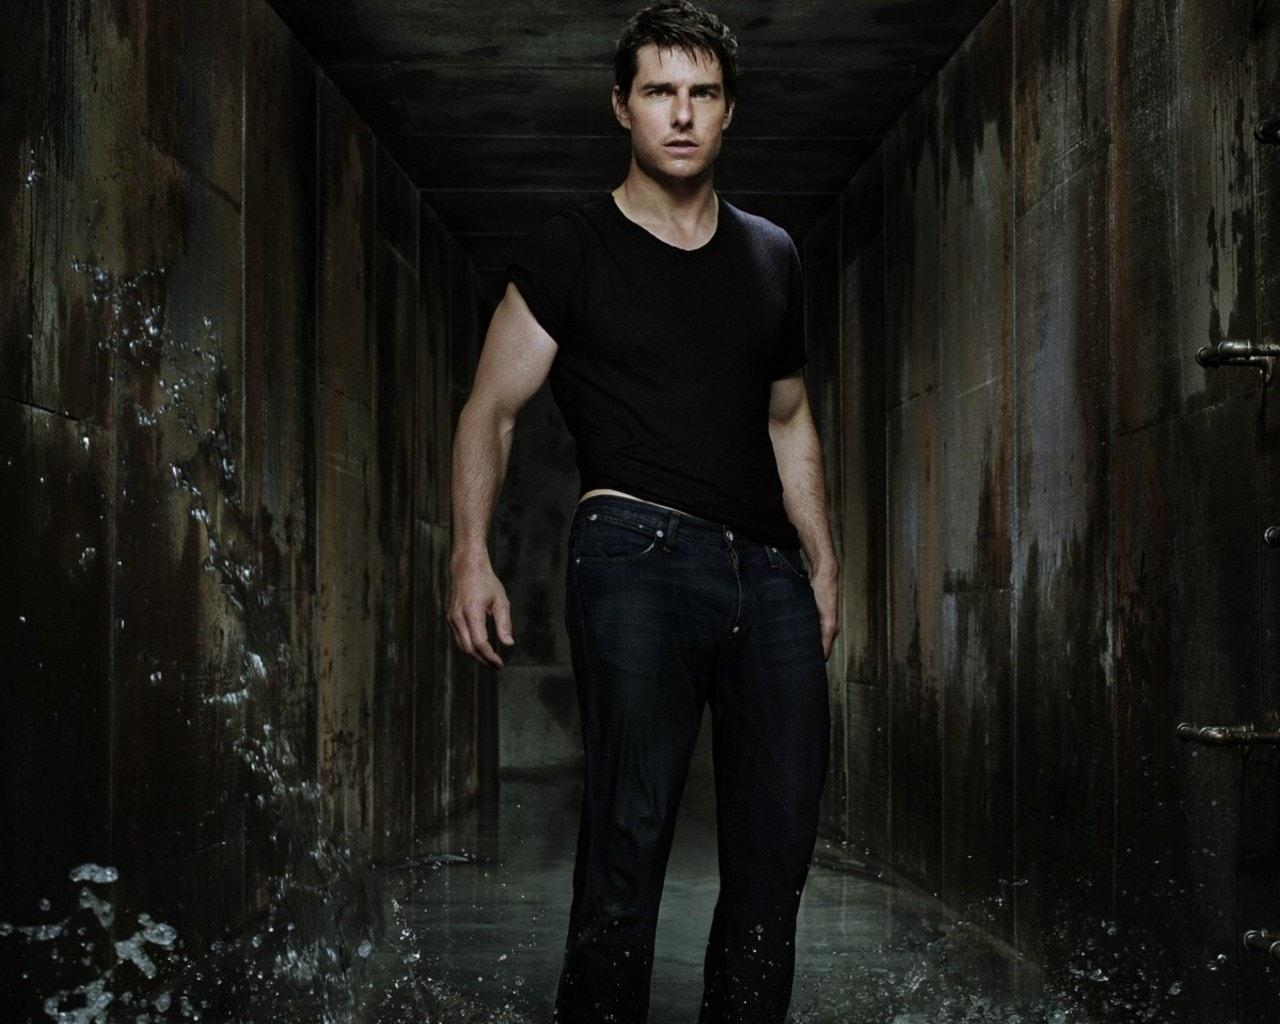 Tom Cruise HD Desktop Wallpapers 7wallpapersnet 1280x1024